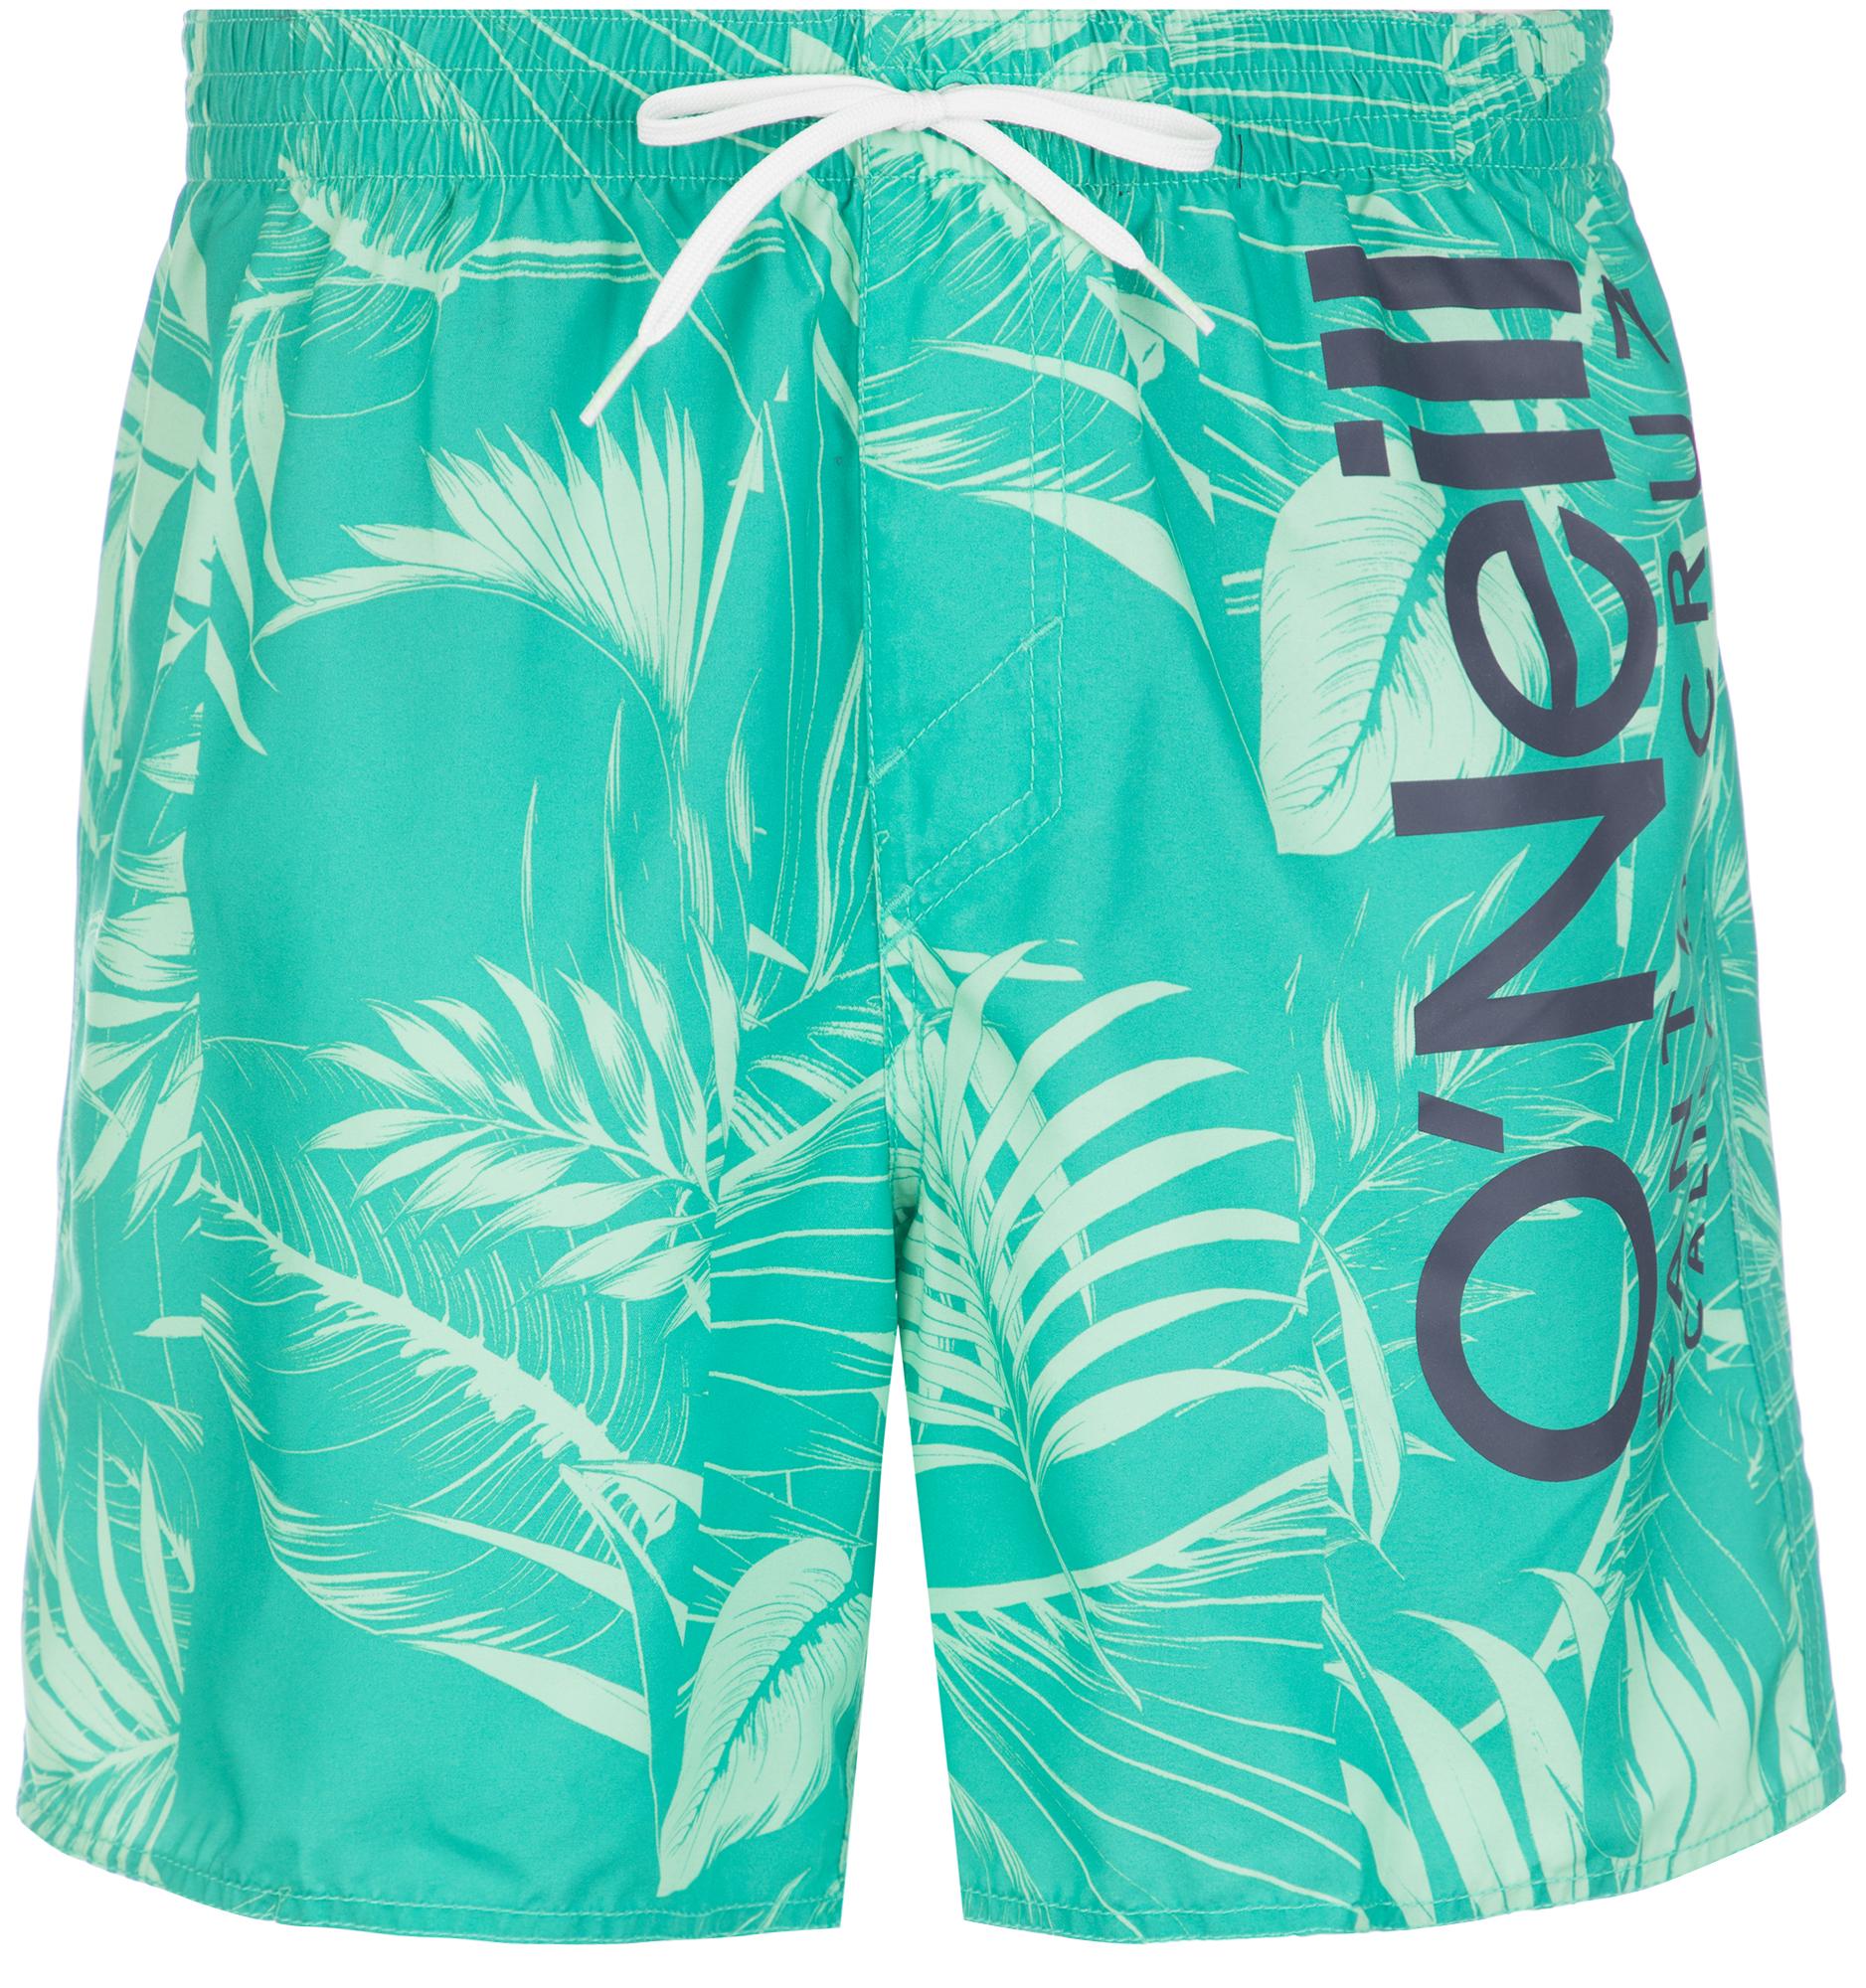 O'Neill Шорты пляжные мужские O'Neill Cali, размер 50-52 шорты пляжные